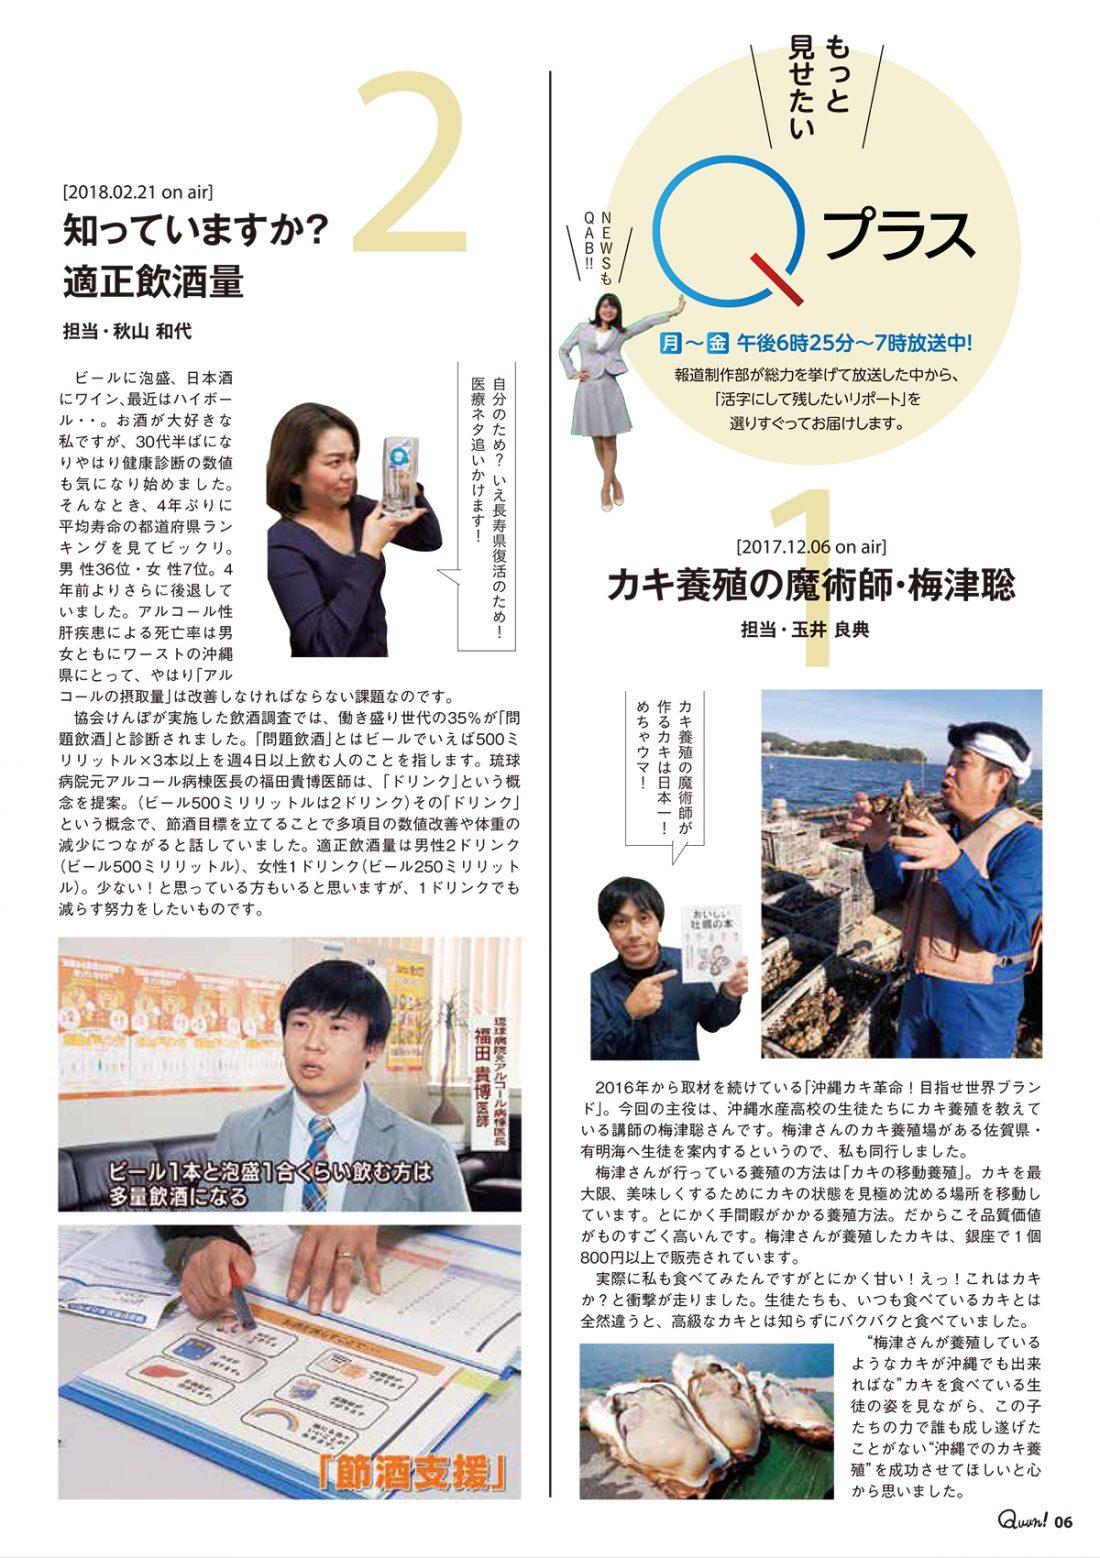 https://www.qab.co.jp/qgoro/wp-content/uploads/quun_0908-1100x1558.jpg